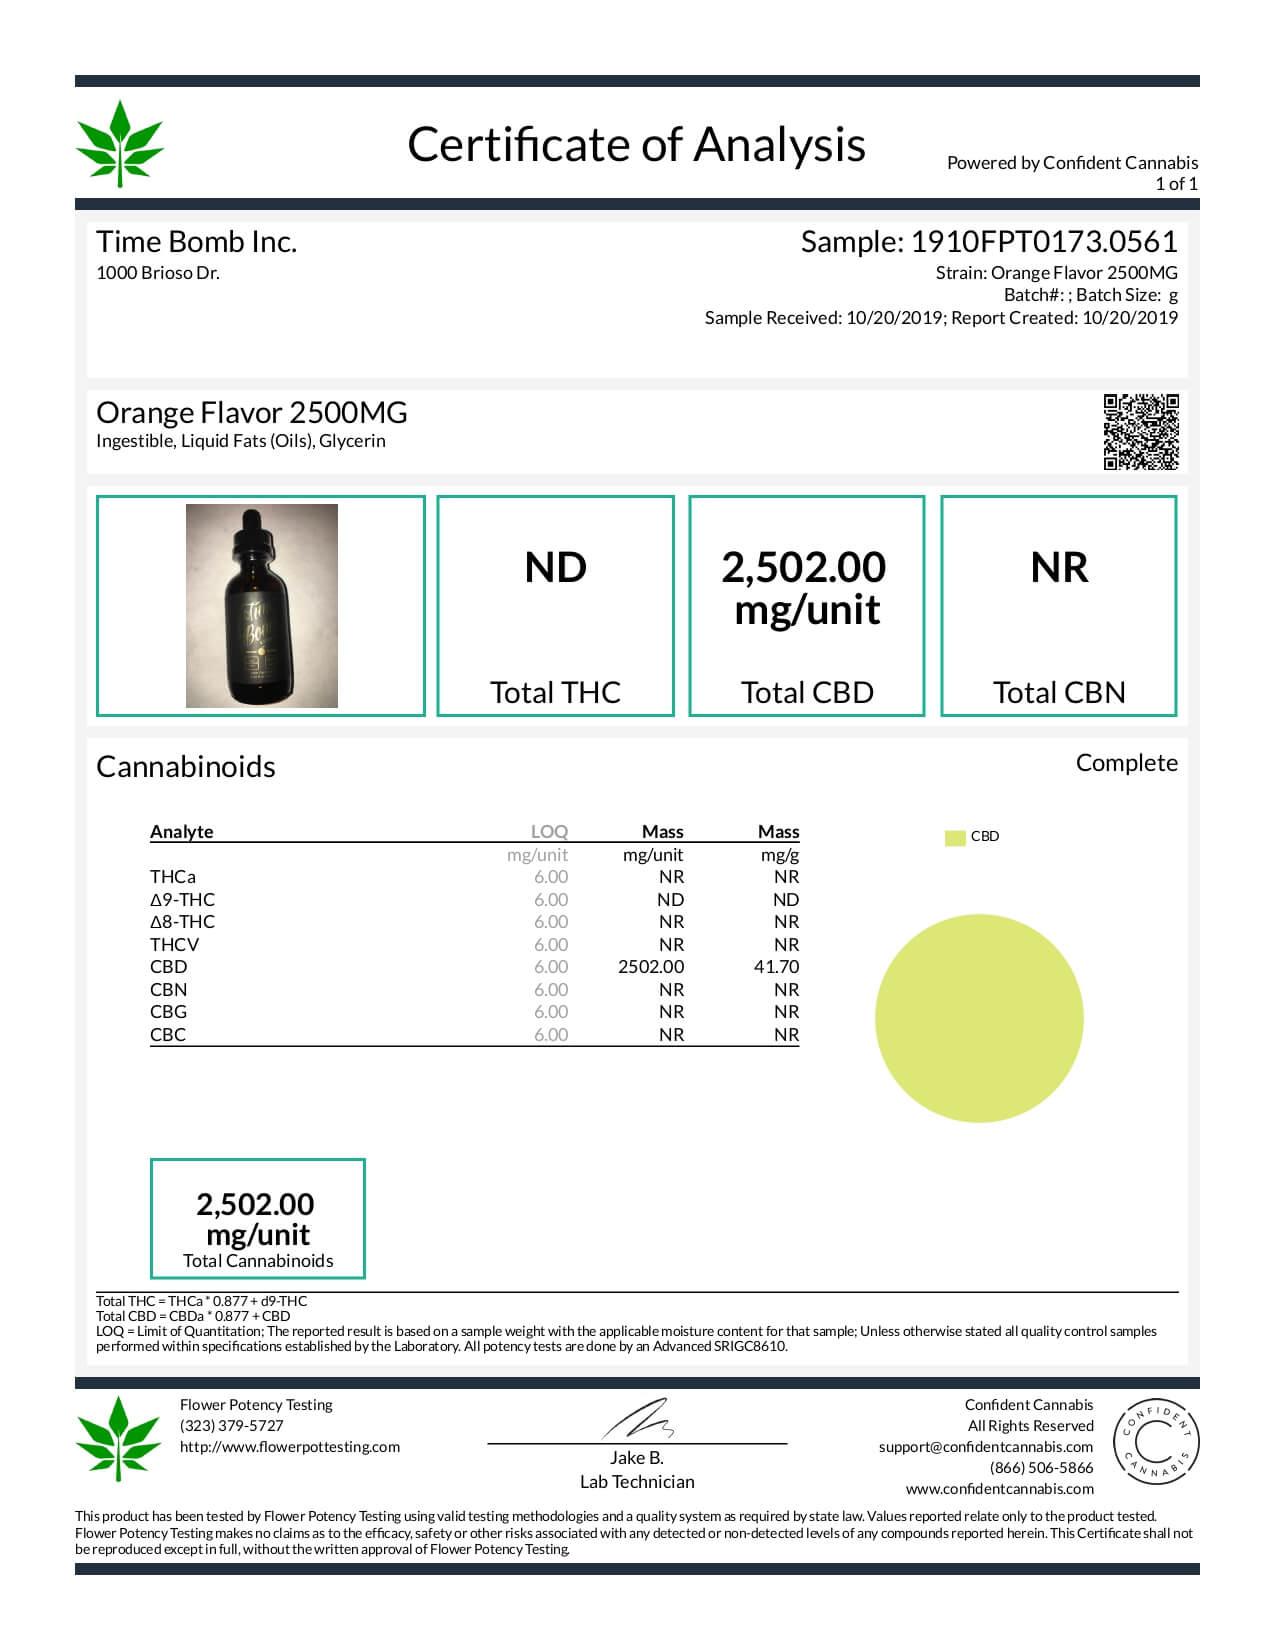 Time Bomb Extracts CBD Tincture Orange 2500mg Lab Report